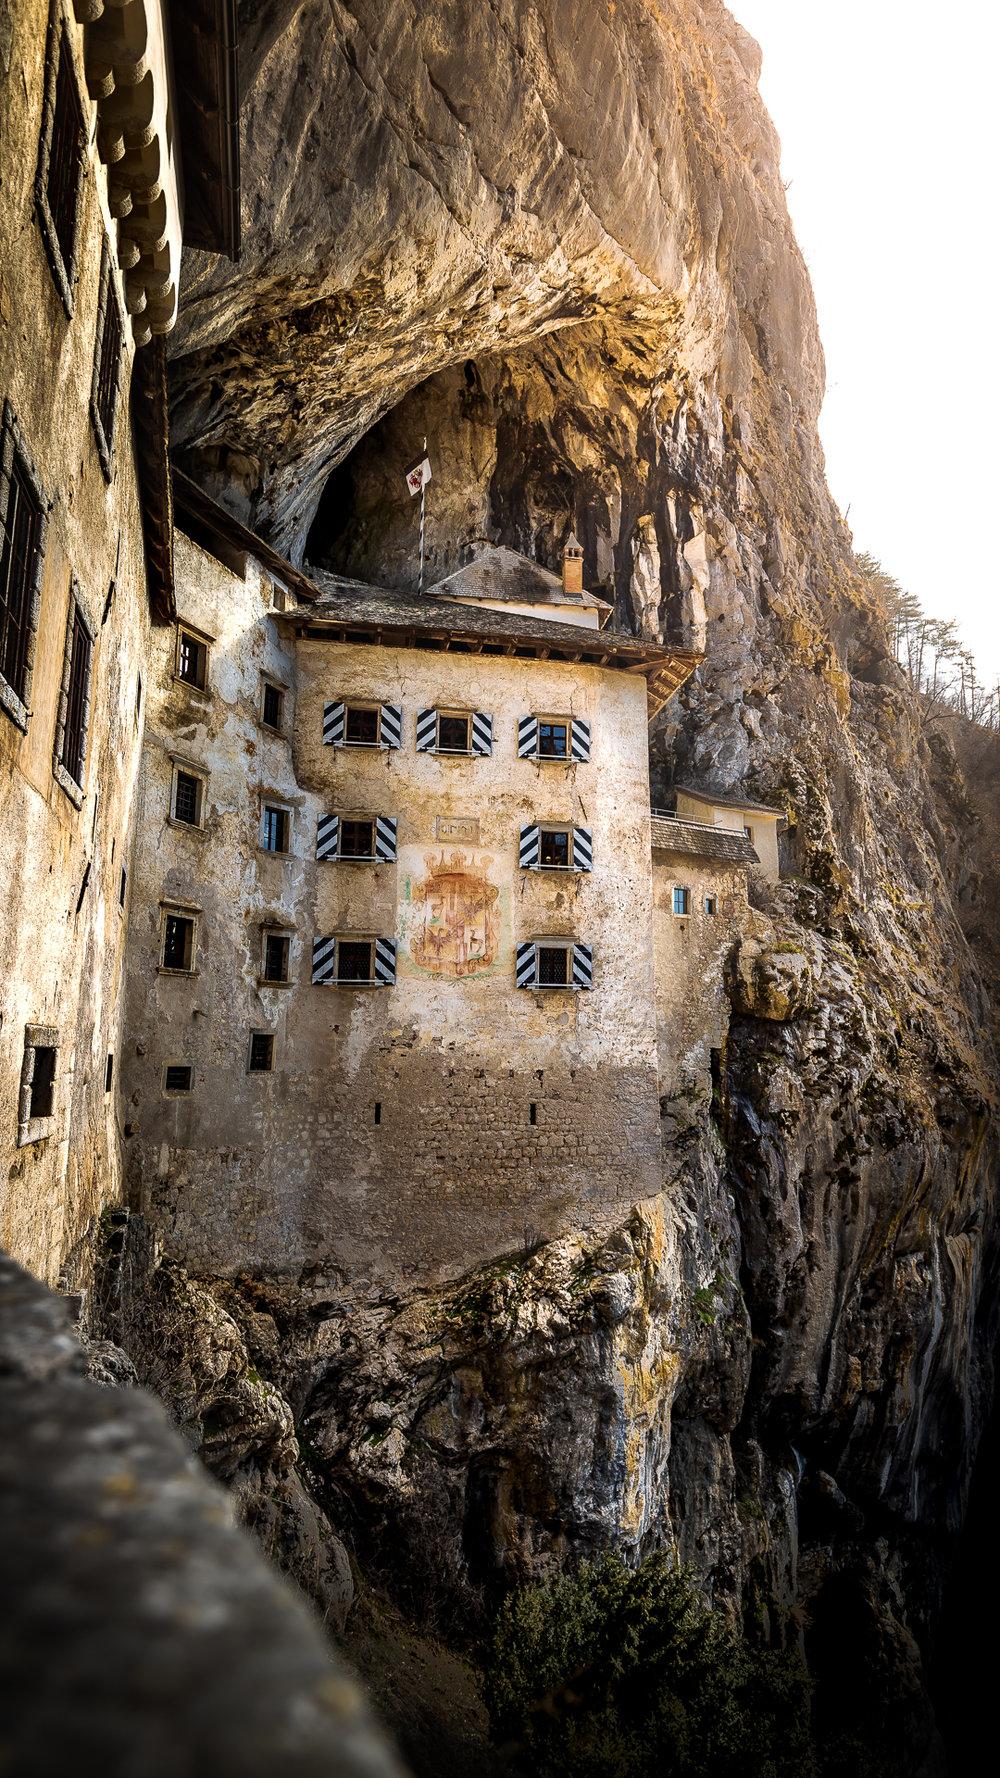 Predjama Castle in all its medieval glory.